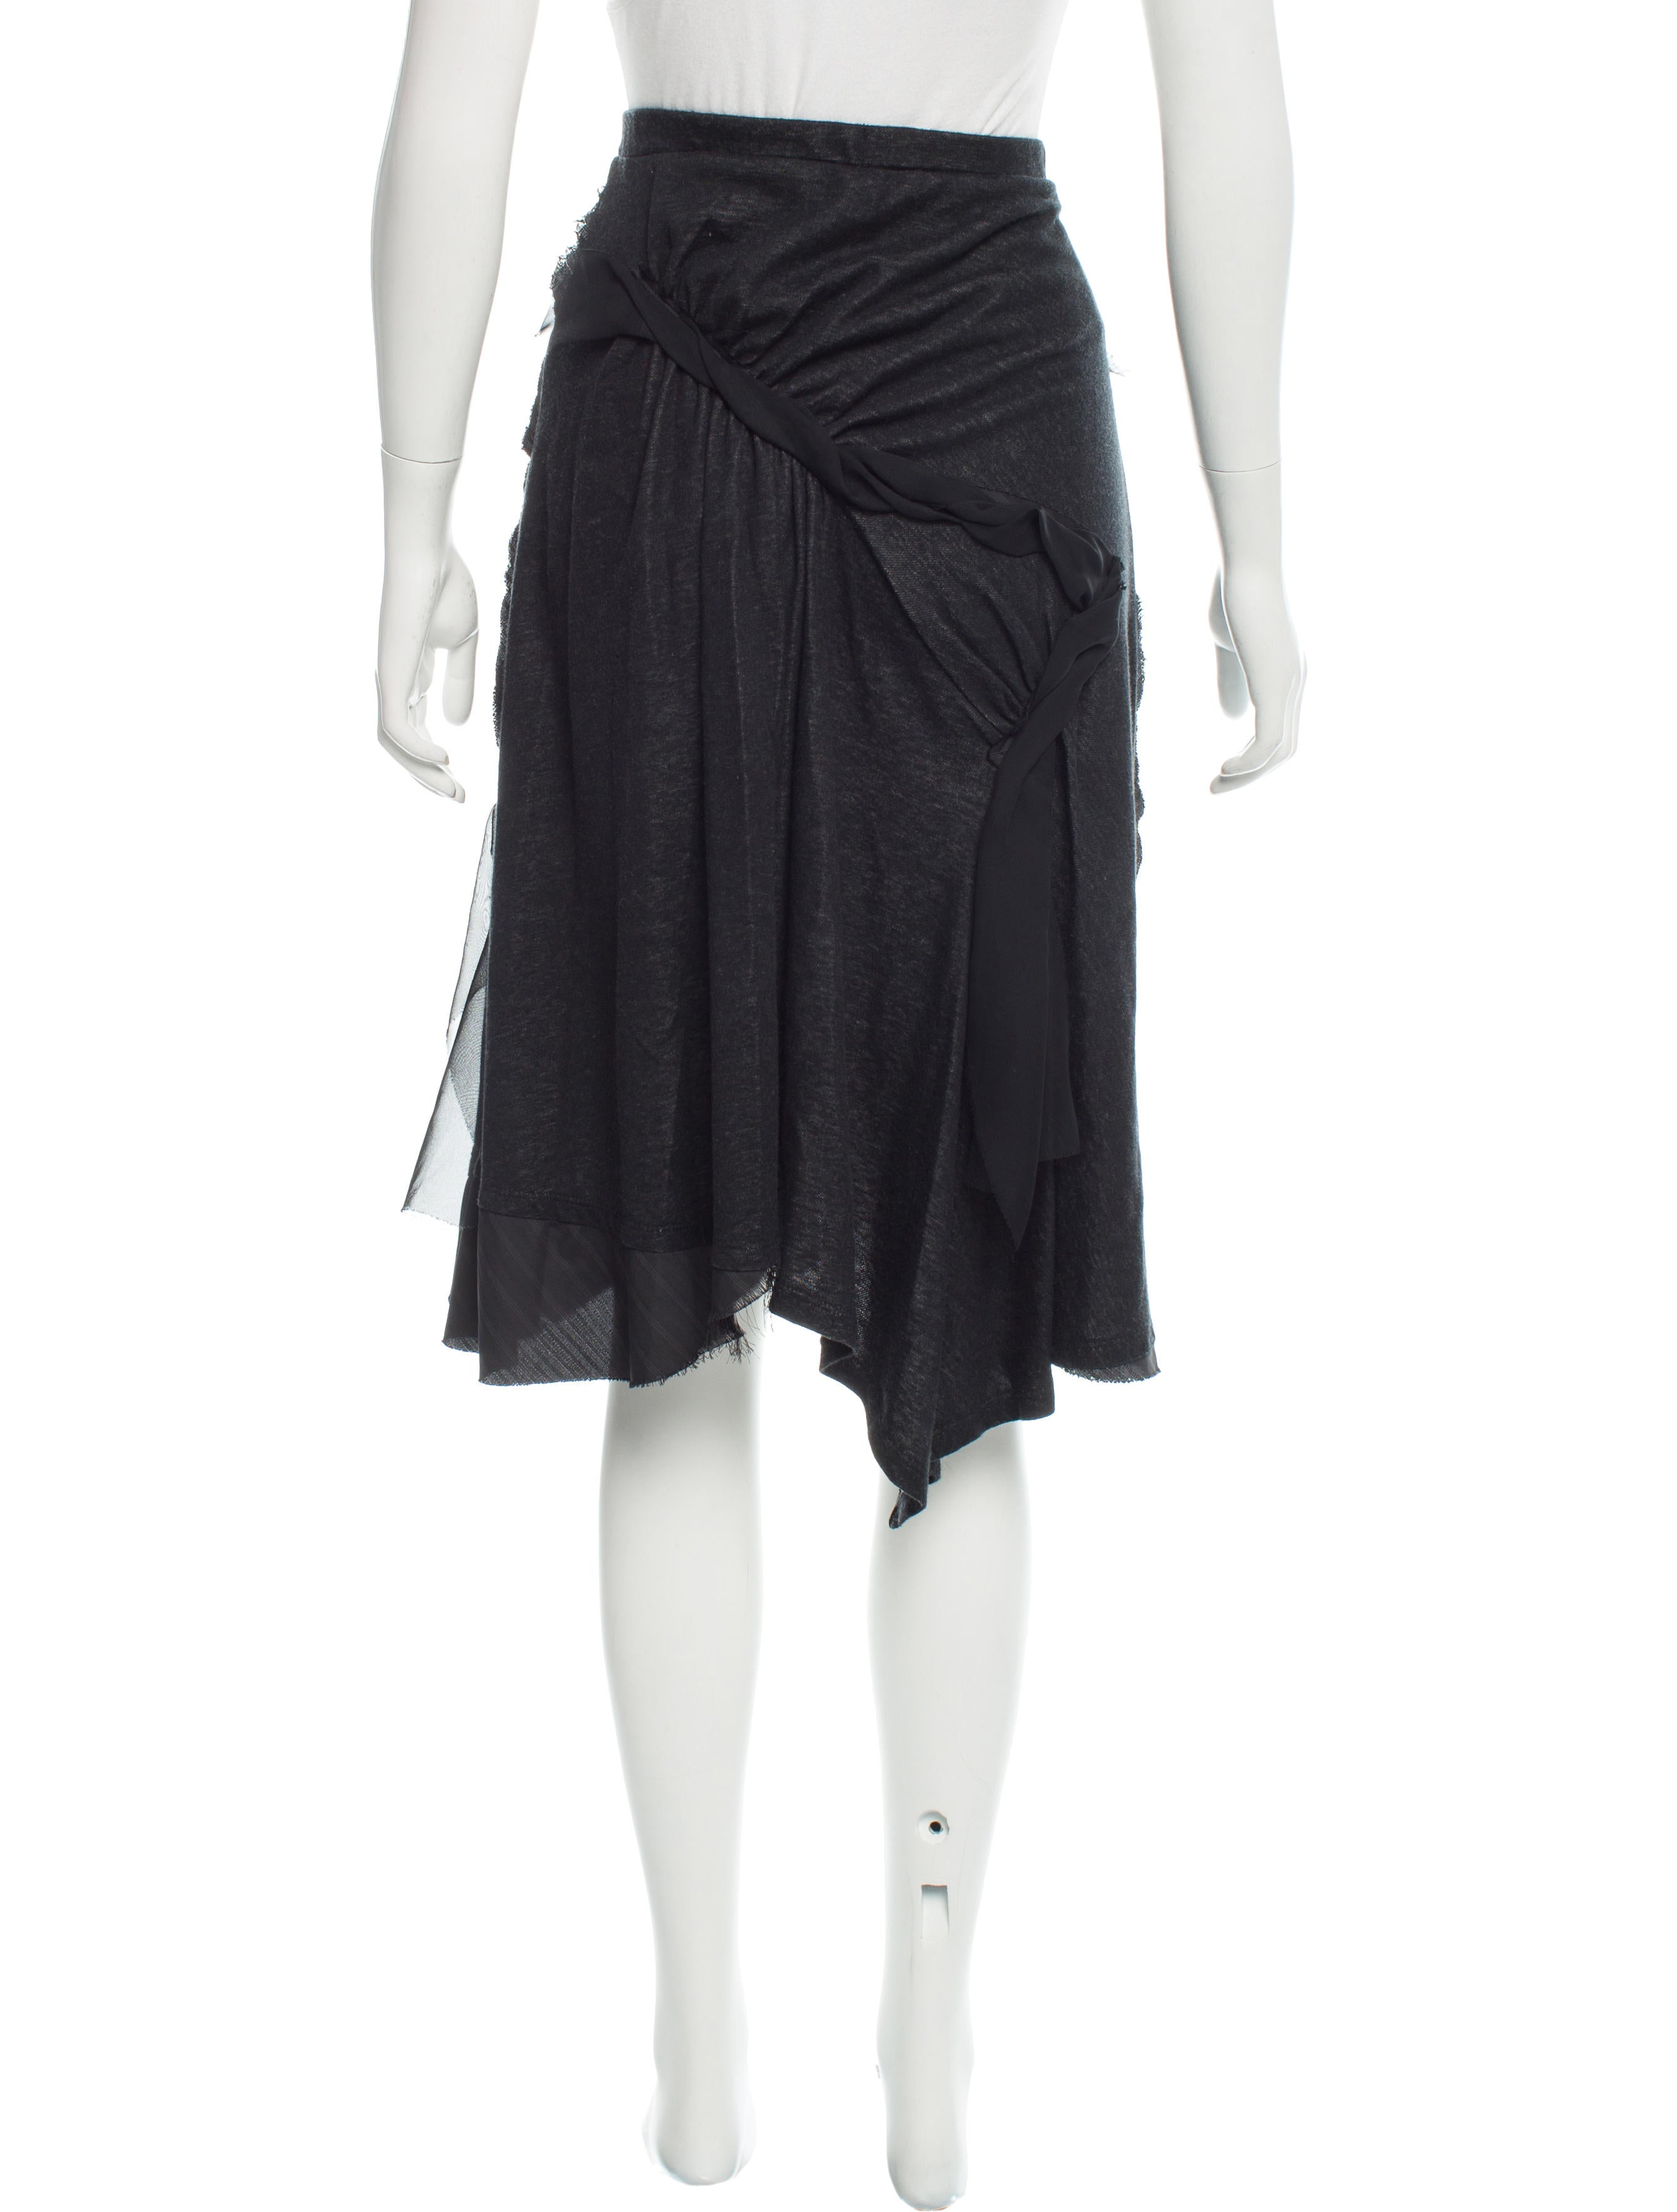 Issey Miyake Knit Asymmetrical Skirt - Clothing